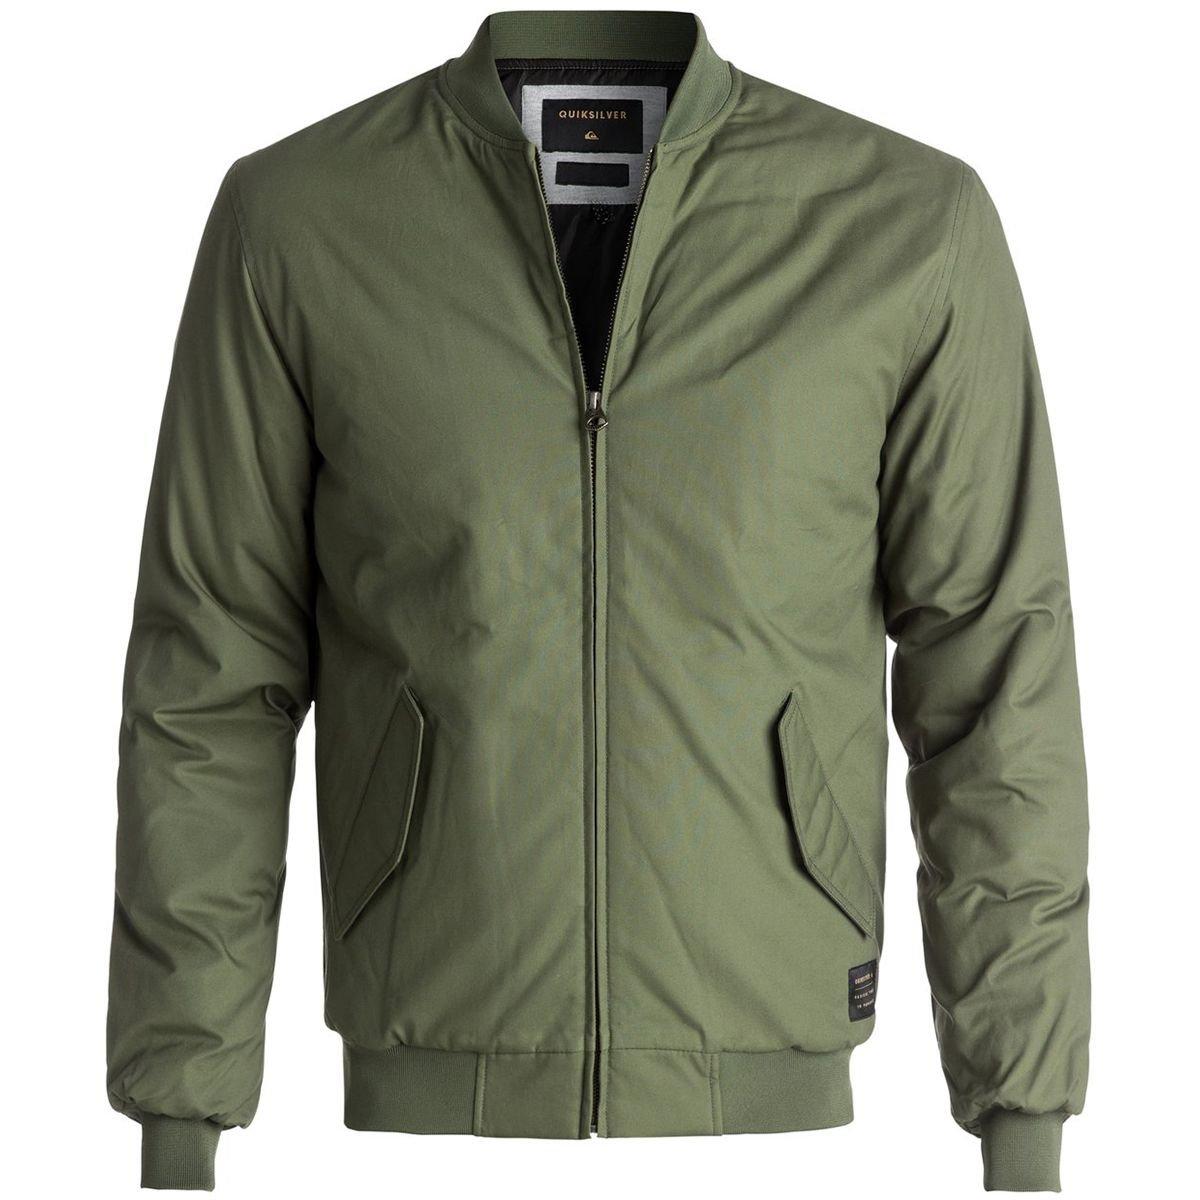 Quiksilver Men's Ogoki Bomber Winter Jacket, Four Leaf Clover, L